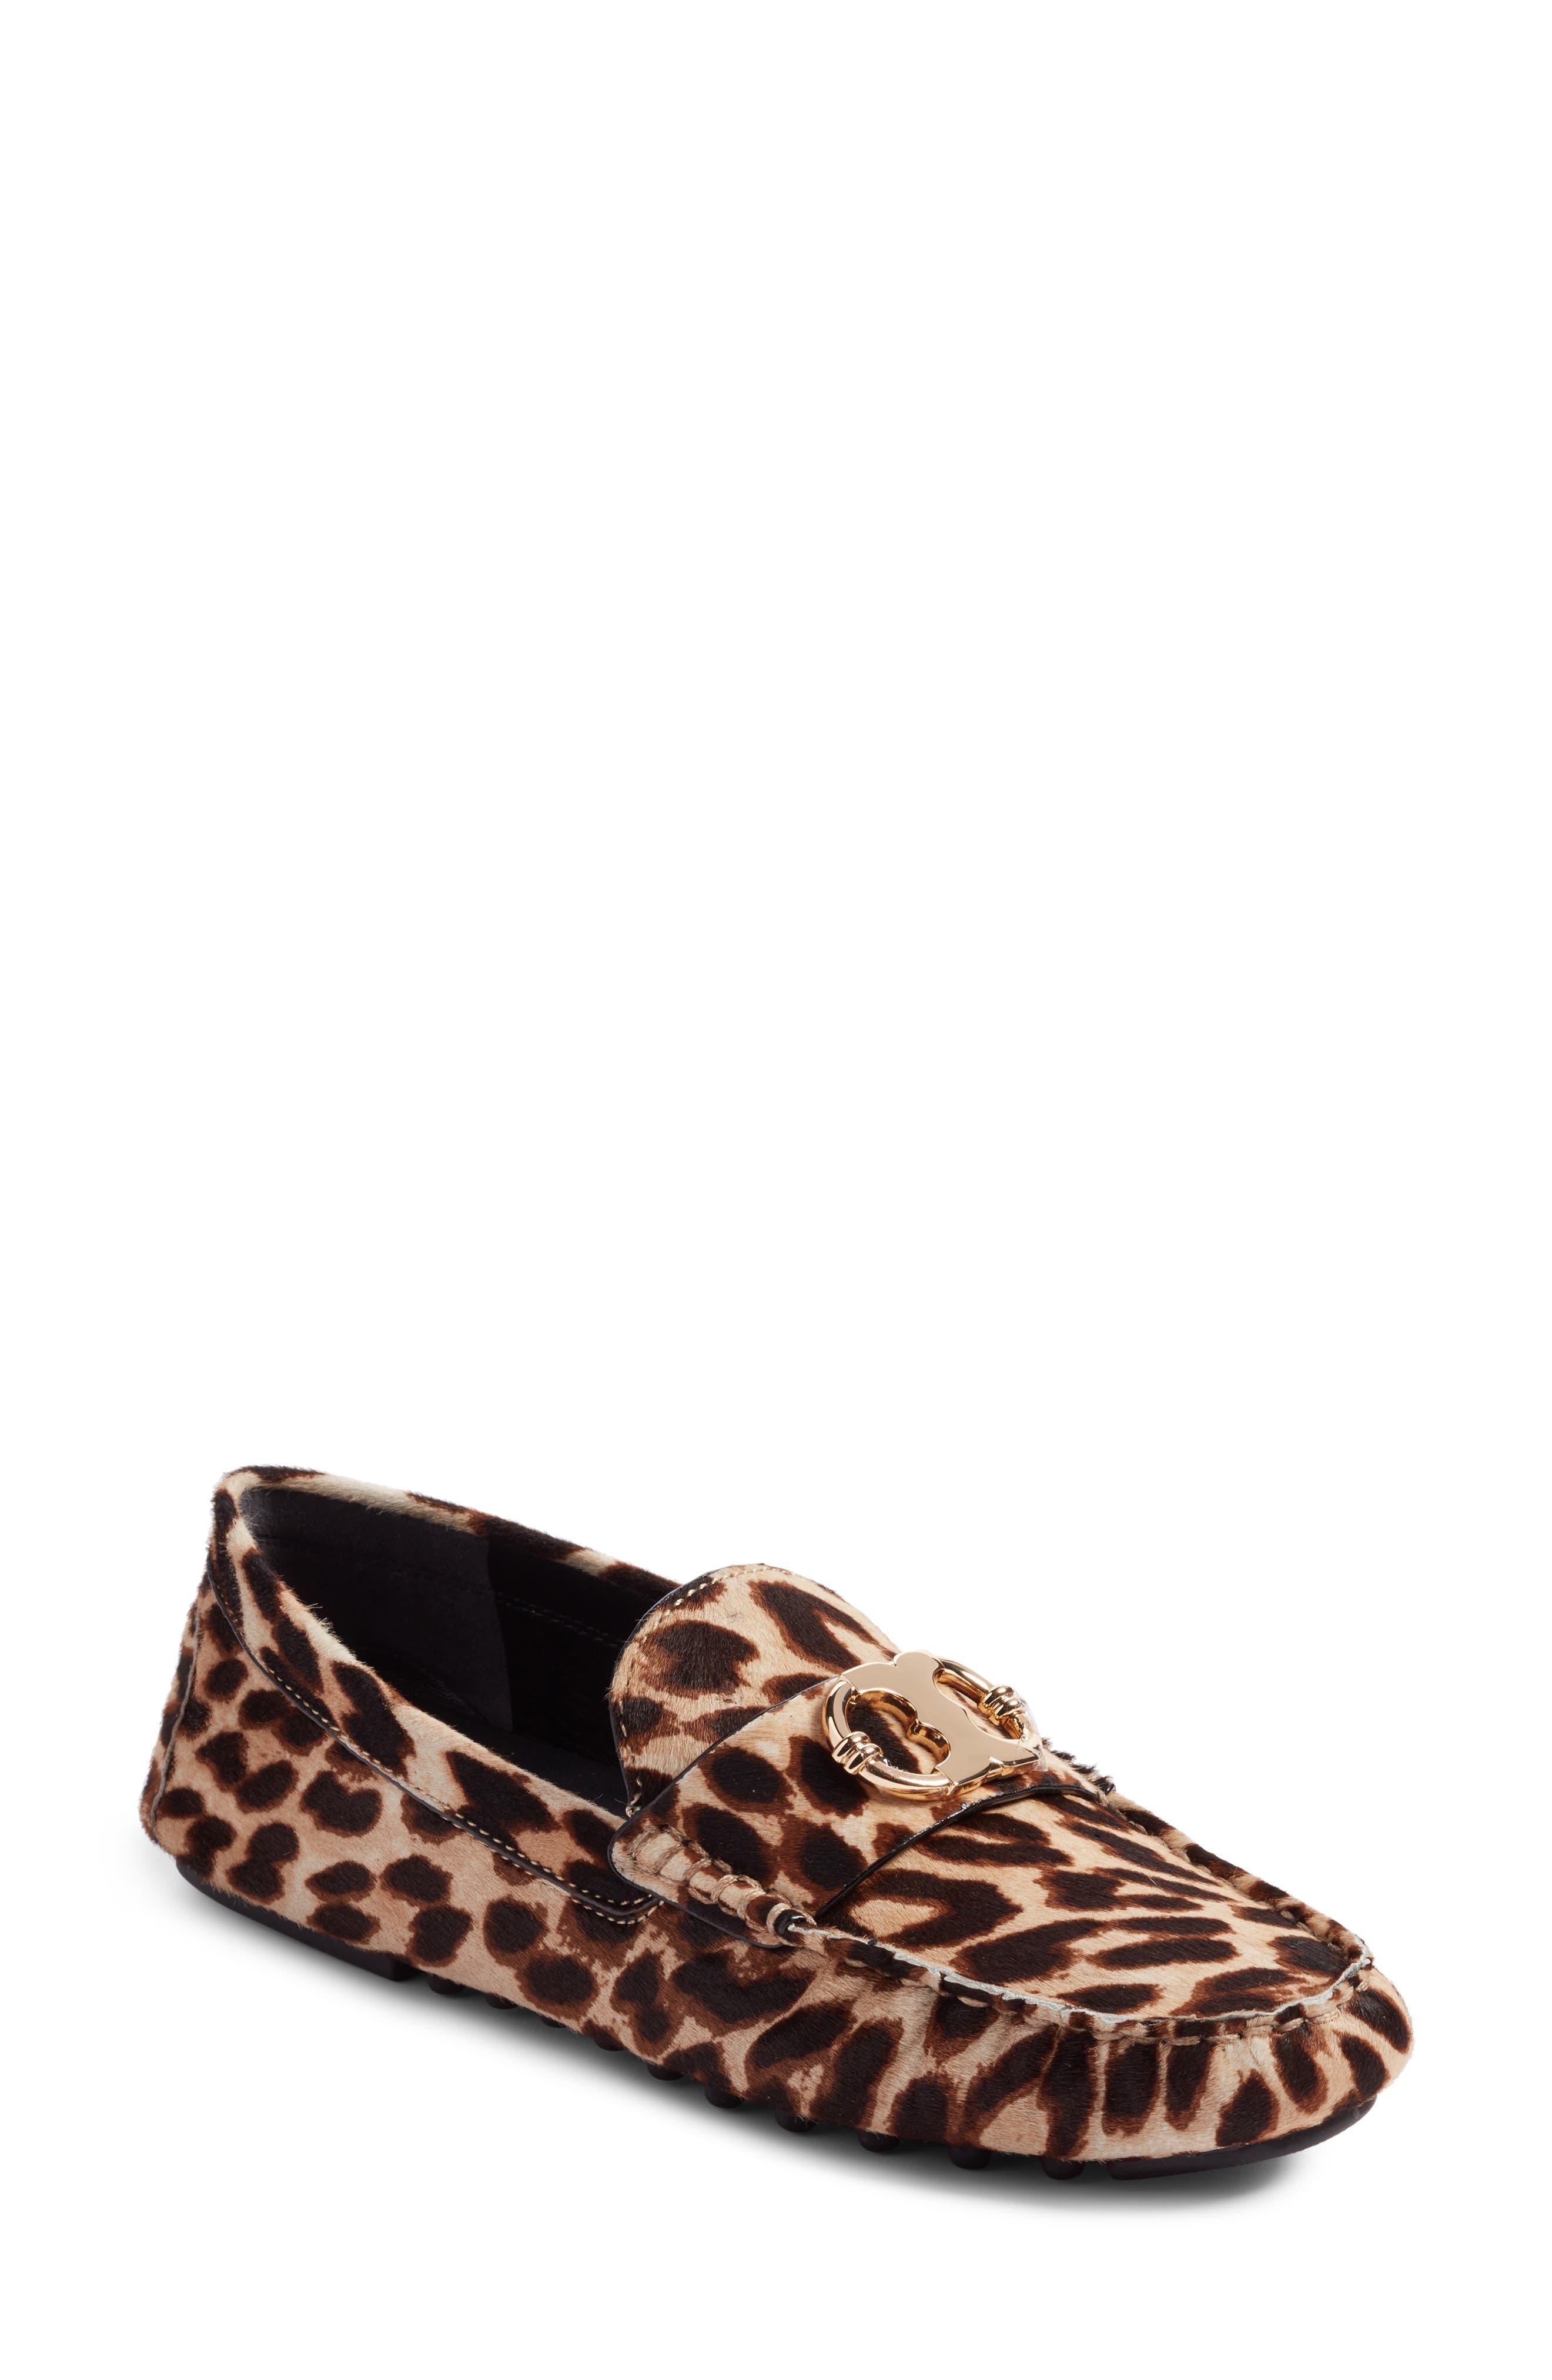 Tory Burch Gemini Genuine Calf Hair Driving Loafer (Women)